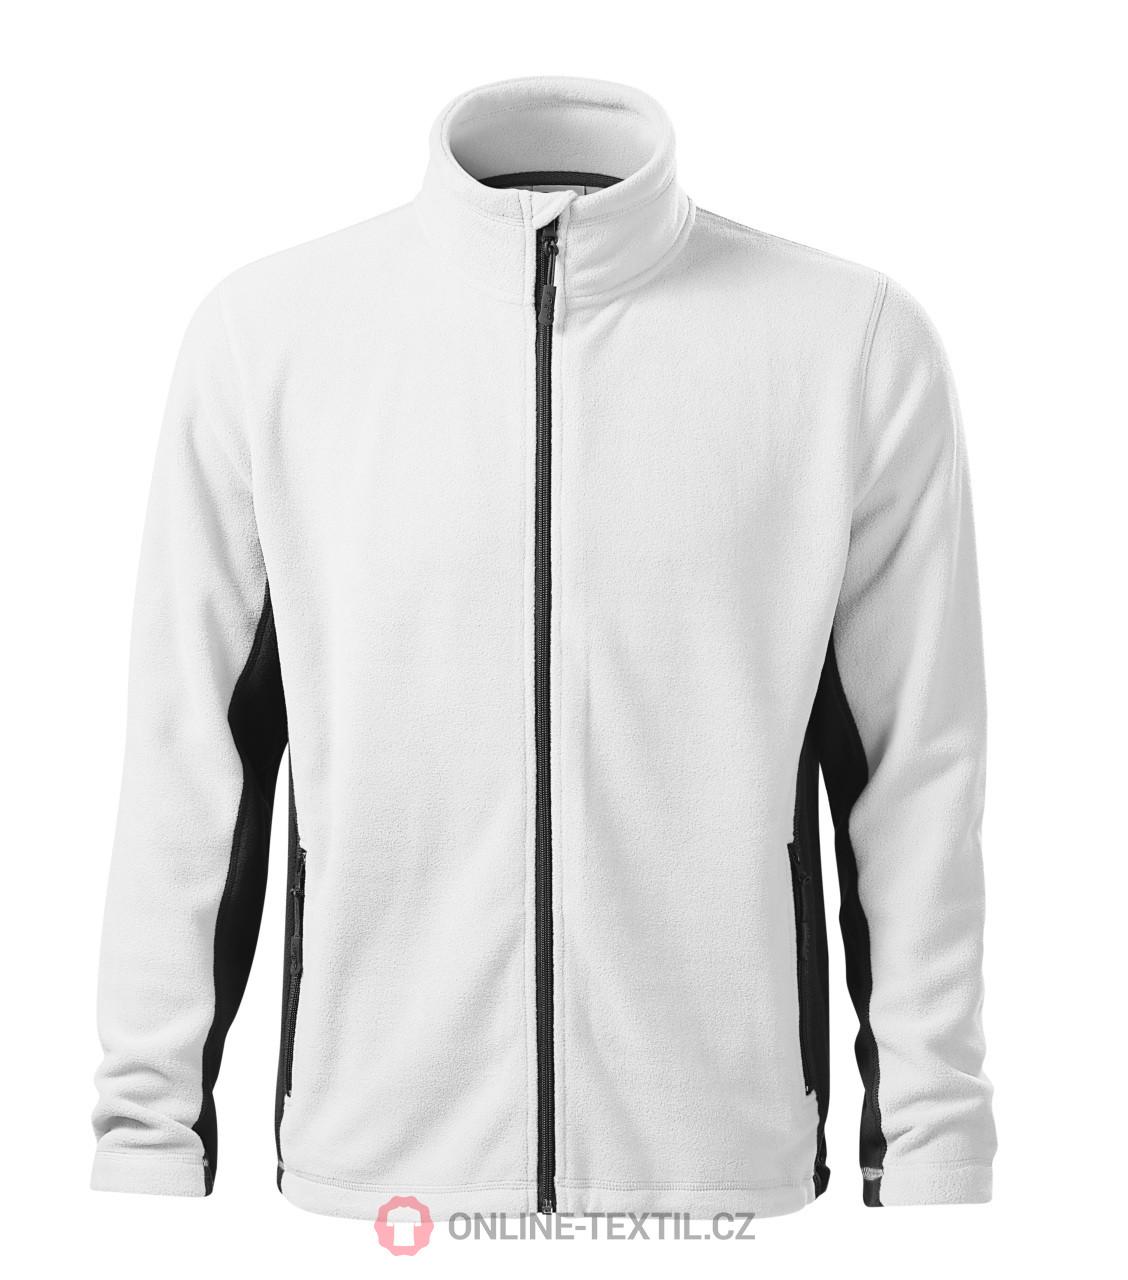 Gents fleece jacket/sweatshirt Frosty ...